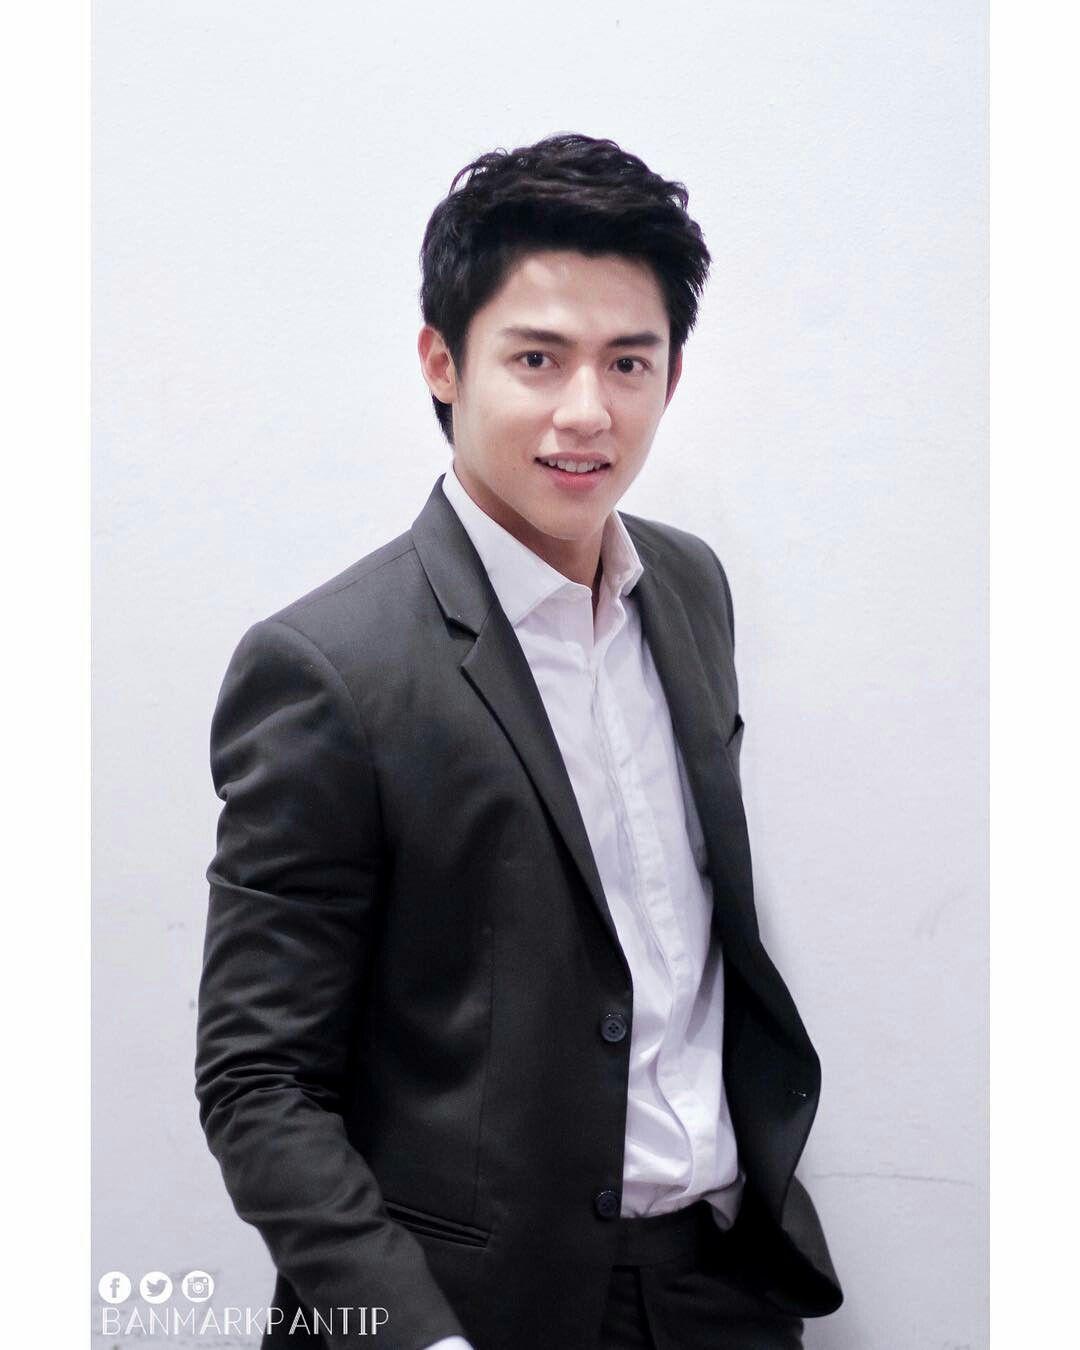 Pin by POPON 14 on MARK PRIN in 2019 | Mark prin, Thai drama